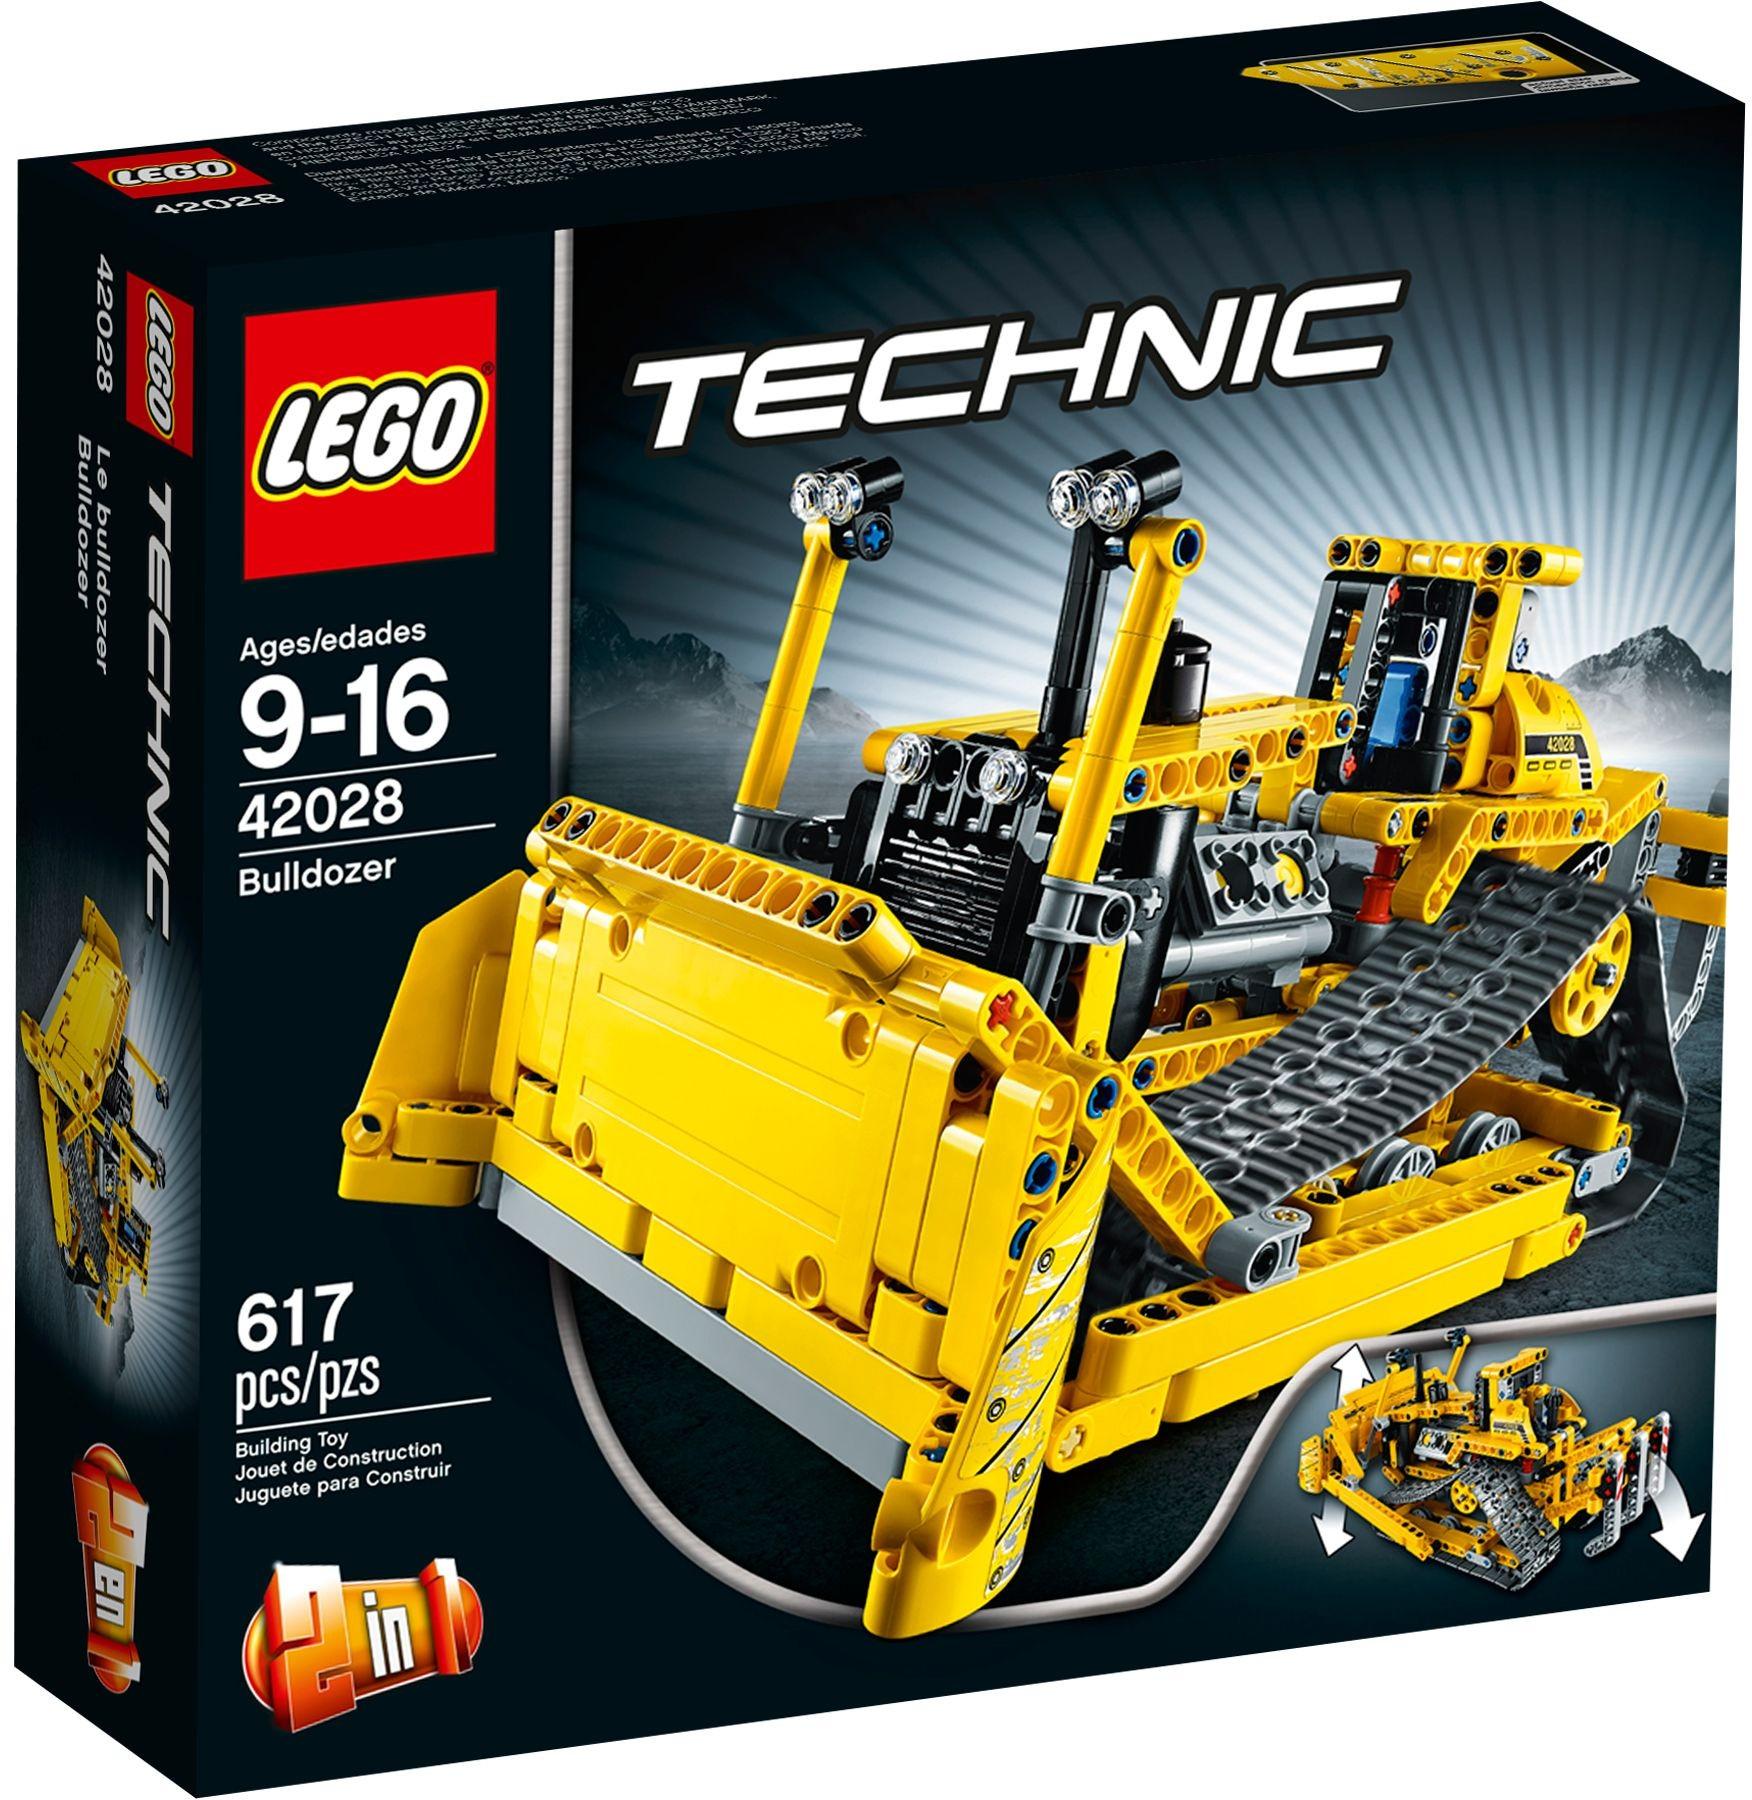 LEGO Technic 42028 Bulldozer aus dem Jahre 2014